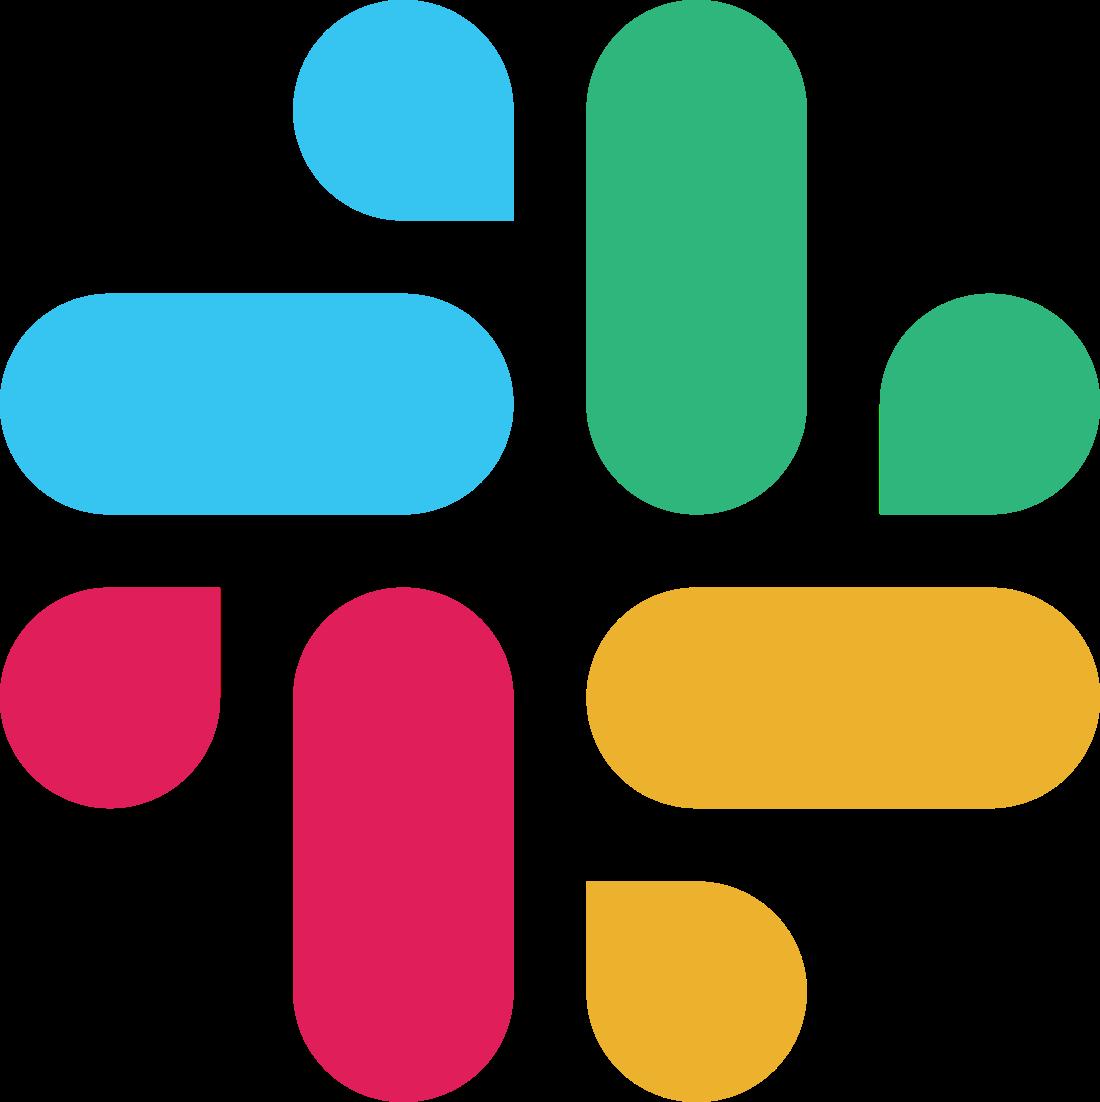 slack logo 5 - Slack Logo